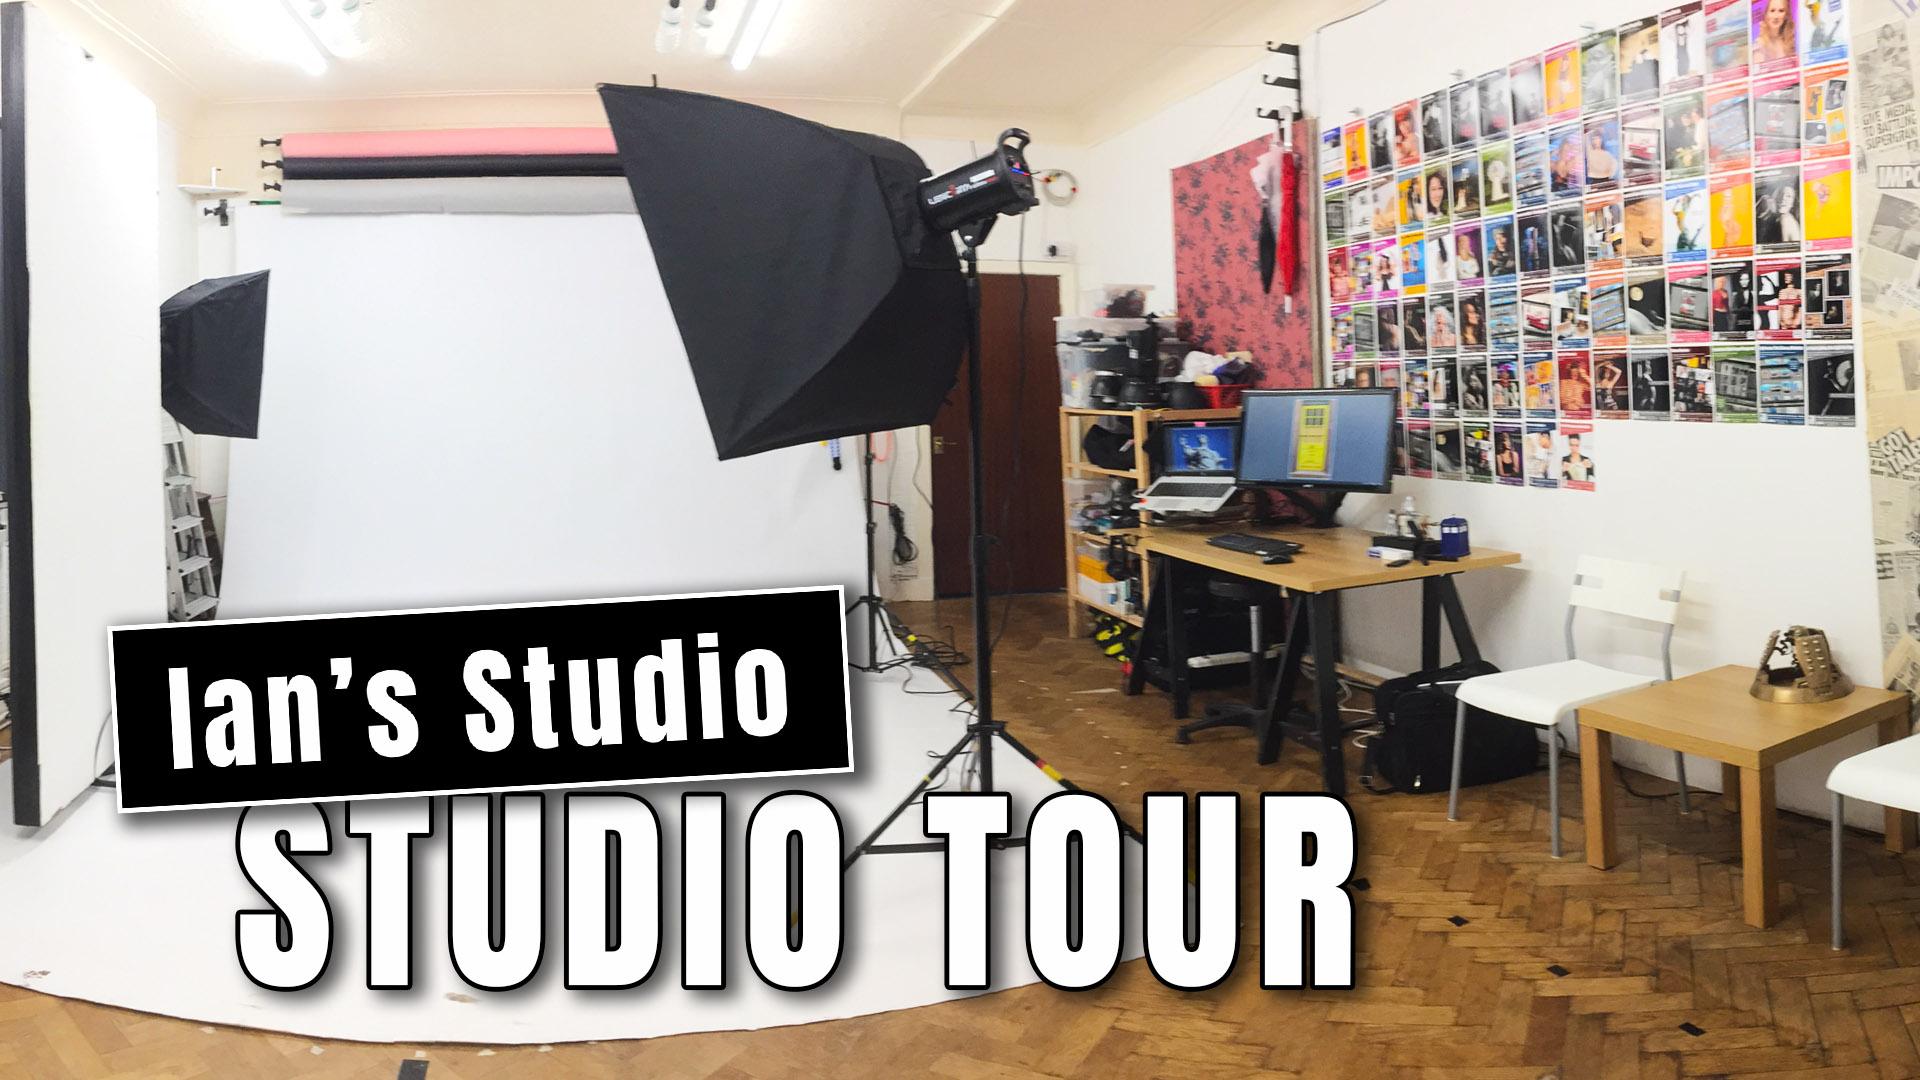 BLOG 3 Aug 2020: Ian's Studio is open… well partially!